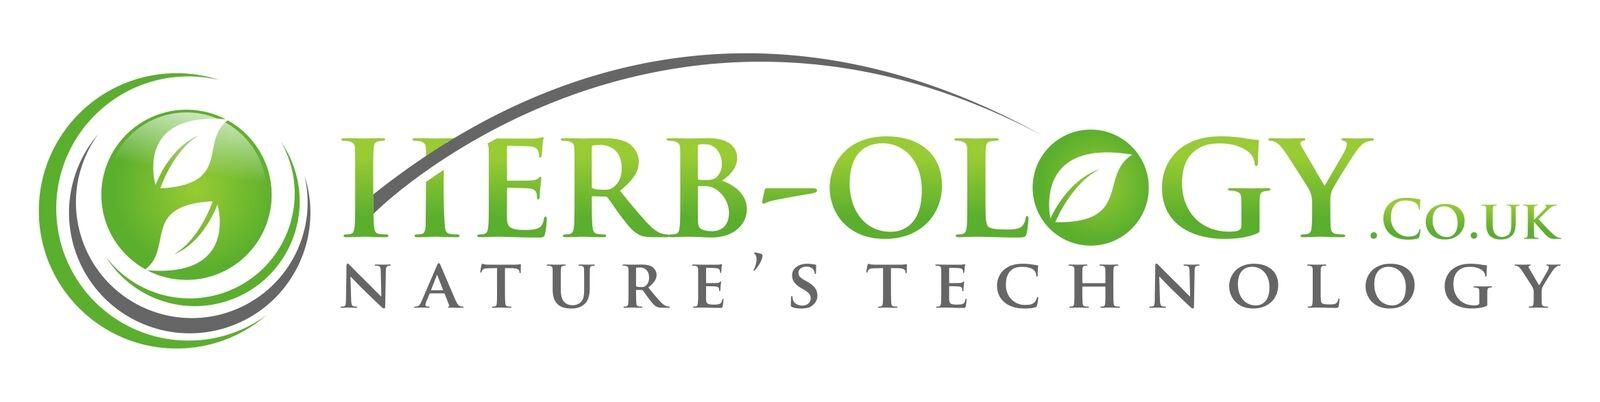 Herb-ology Online UK